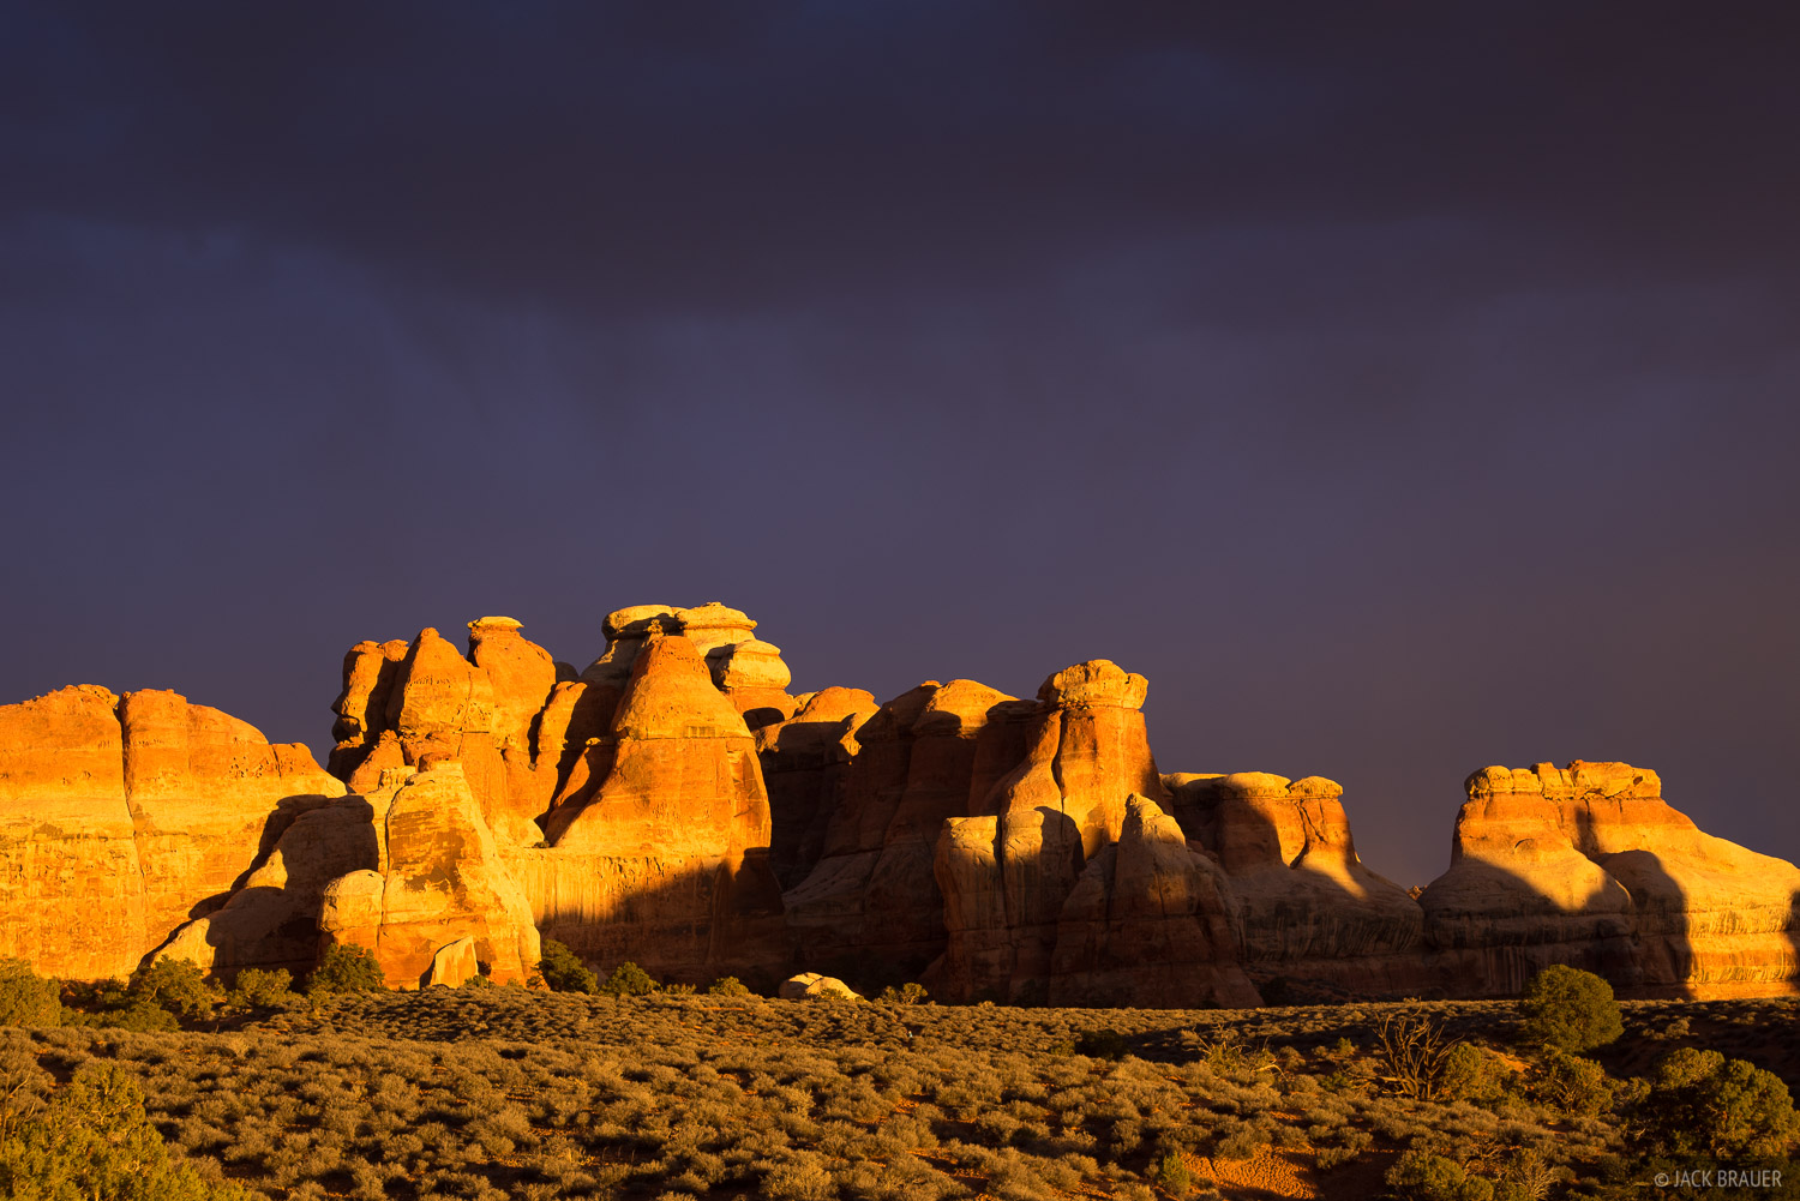 Canyonlands National Park, Needles District, Utah, Chesler Park, photo